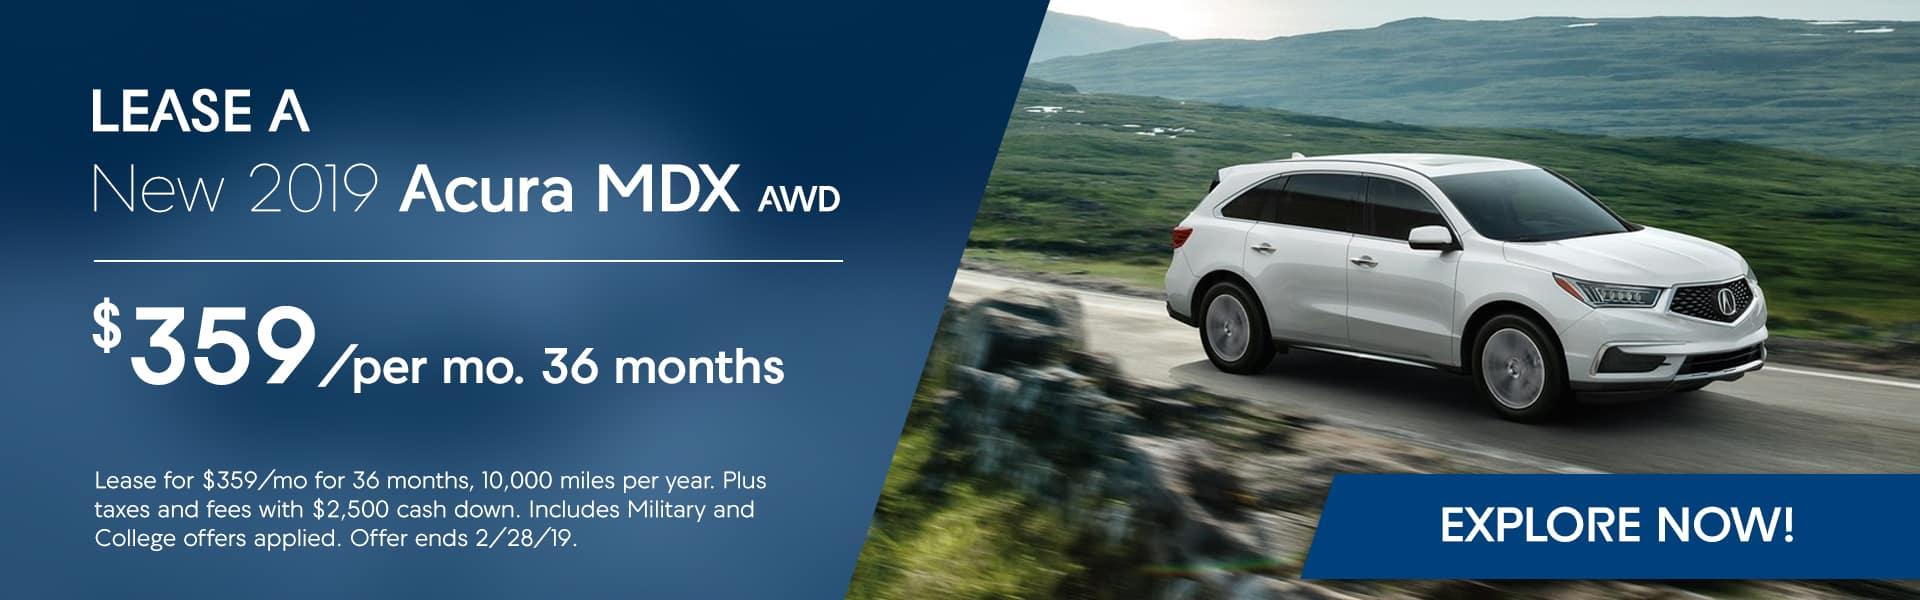 2019 MDX at Hubler Acura